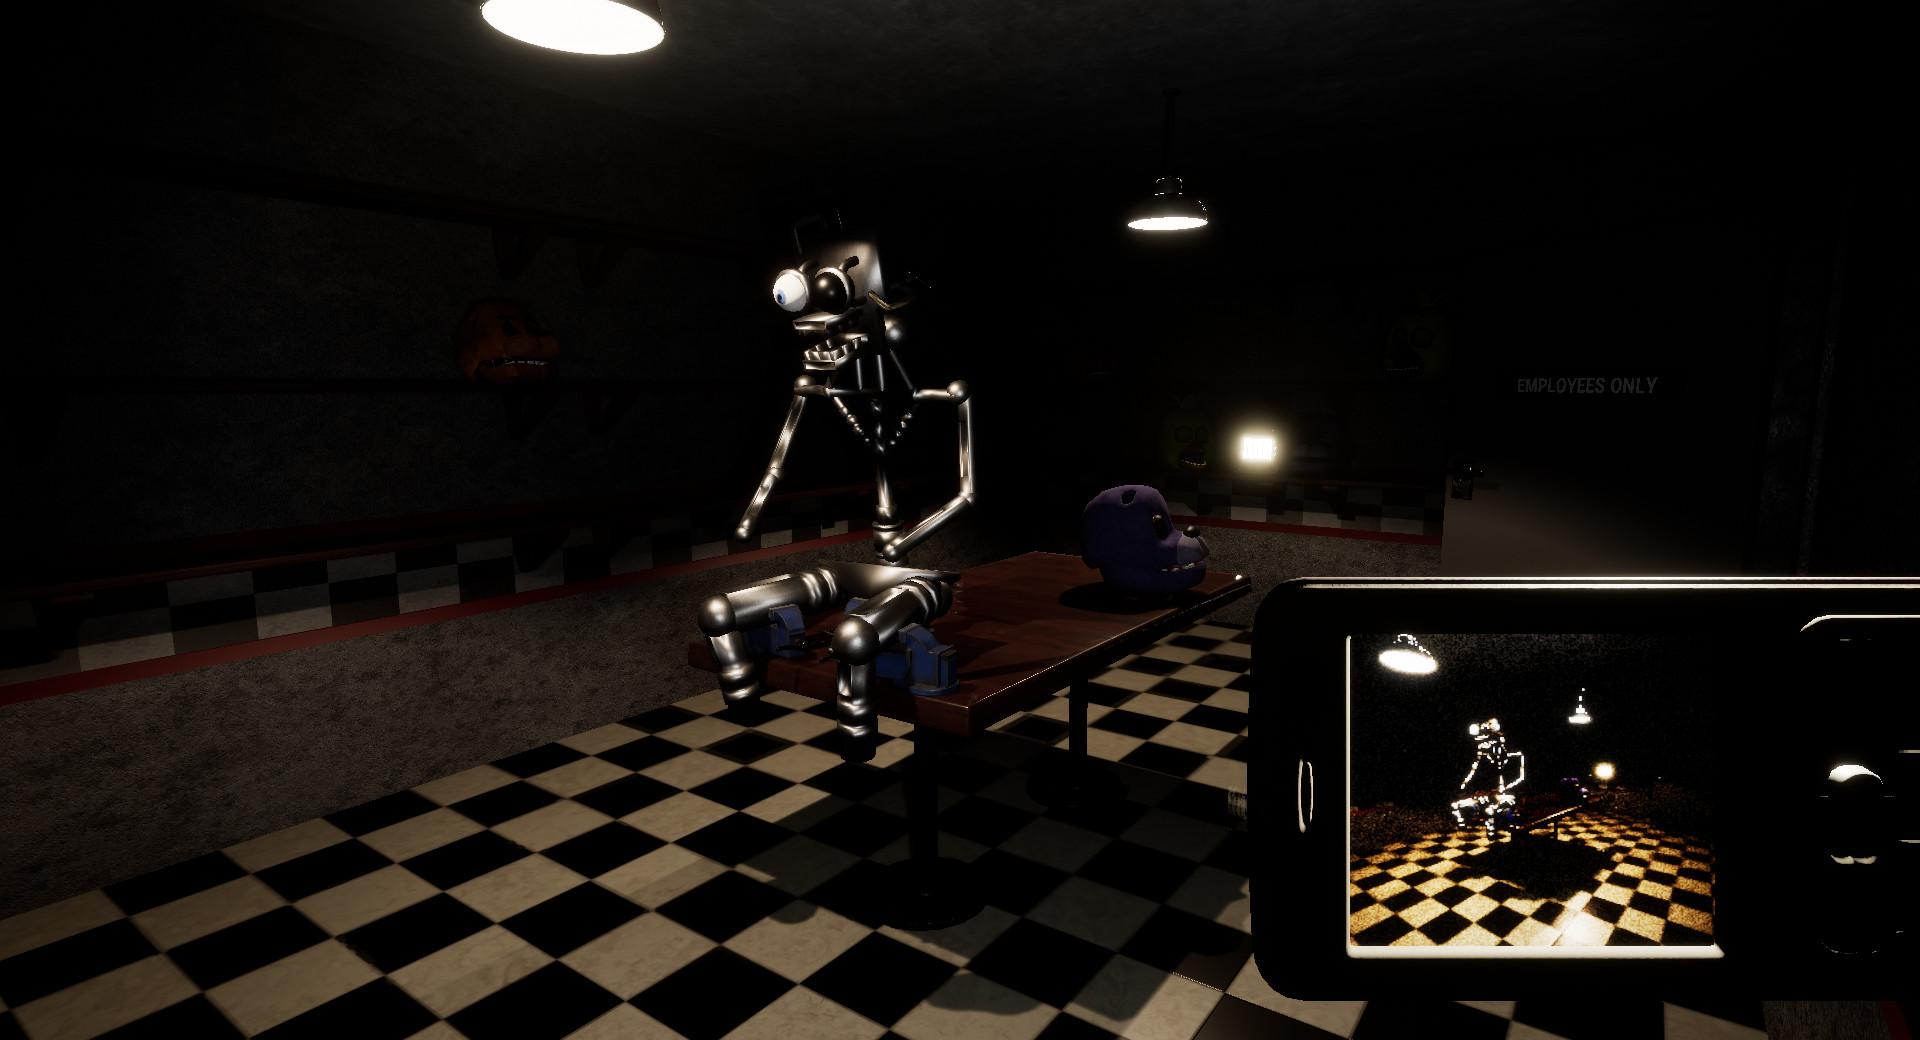 Fazbear Nightmare on Steam